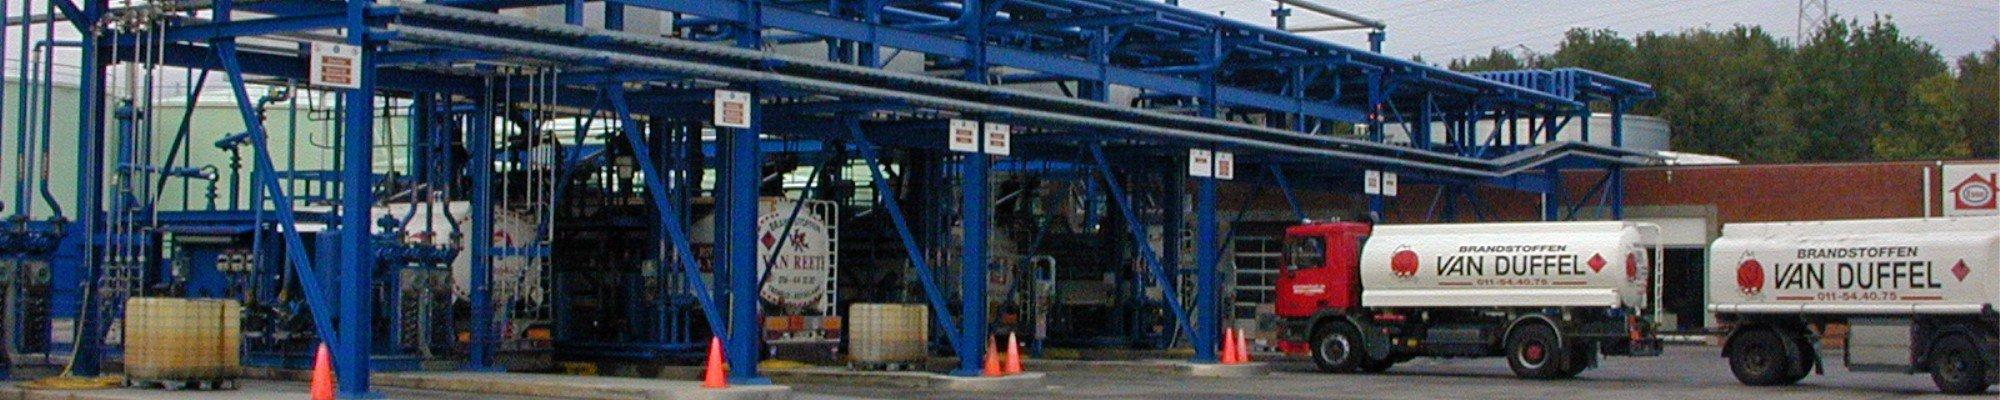 Kalibratie brandstofdepot flowmeters - Header ODS web page